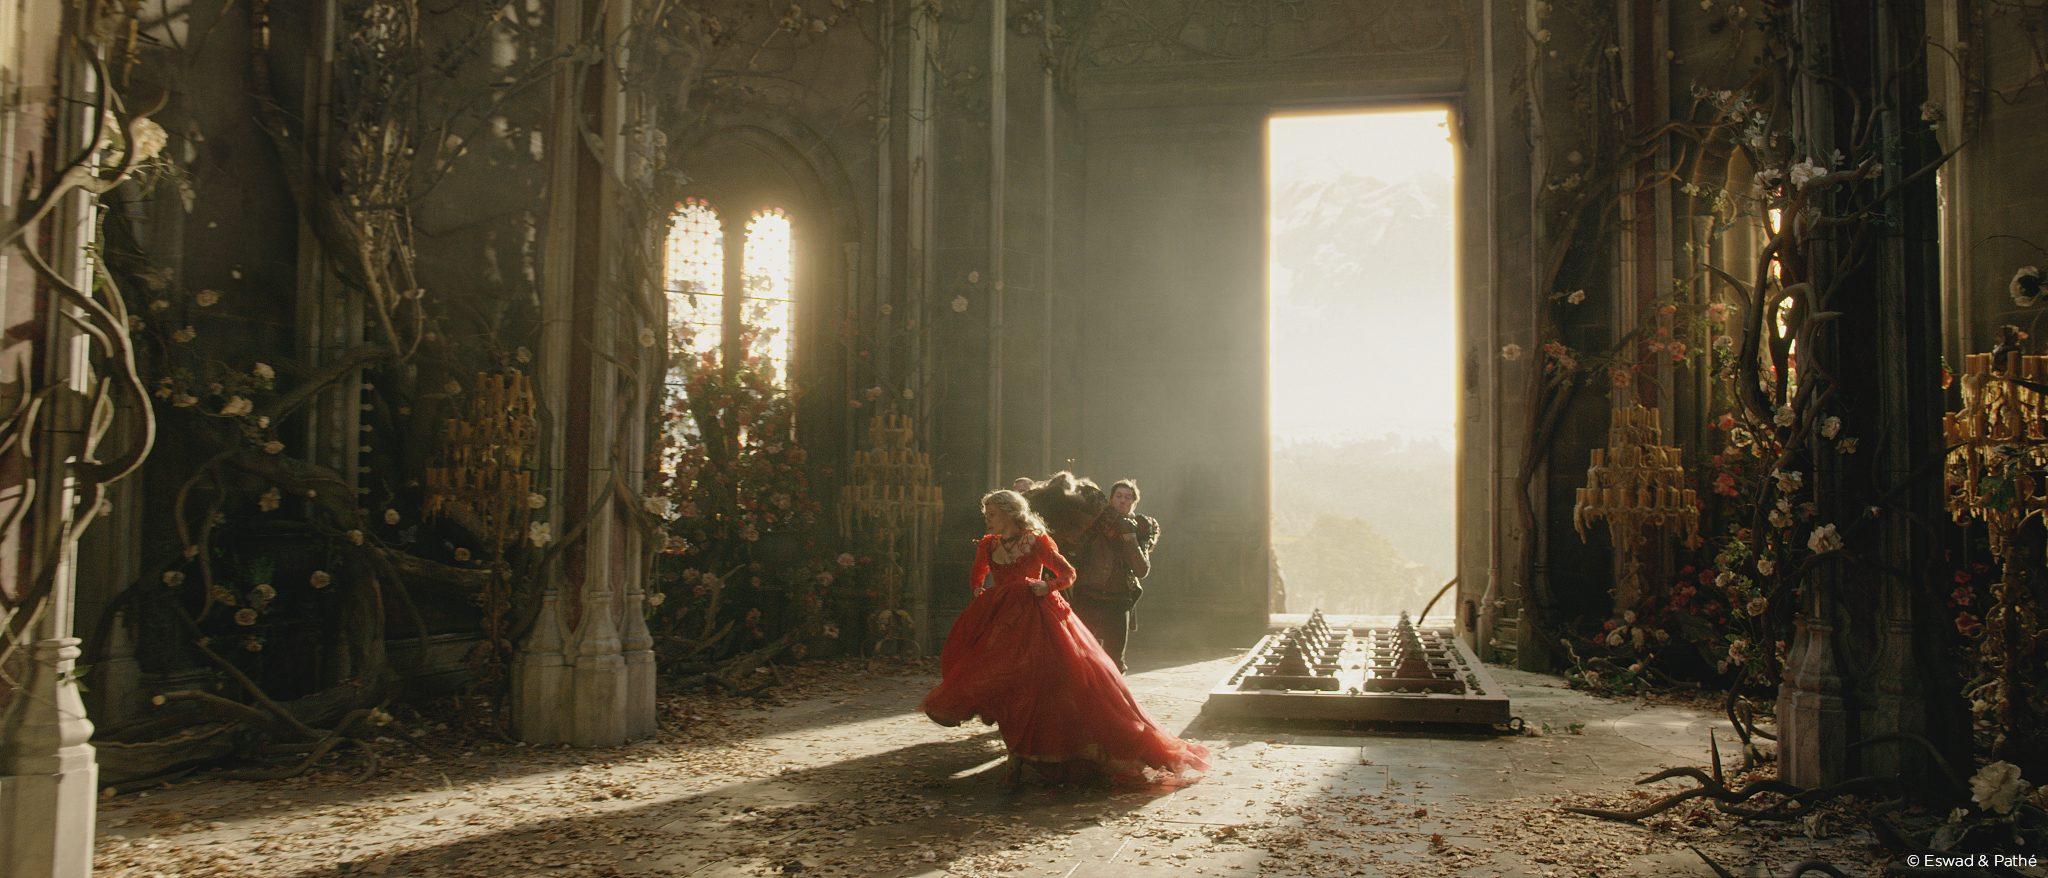 la-belle-et-la-bete-castle-inside-grand-hall